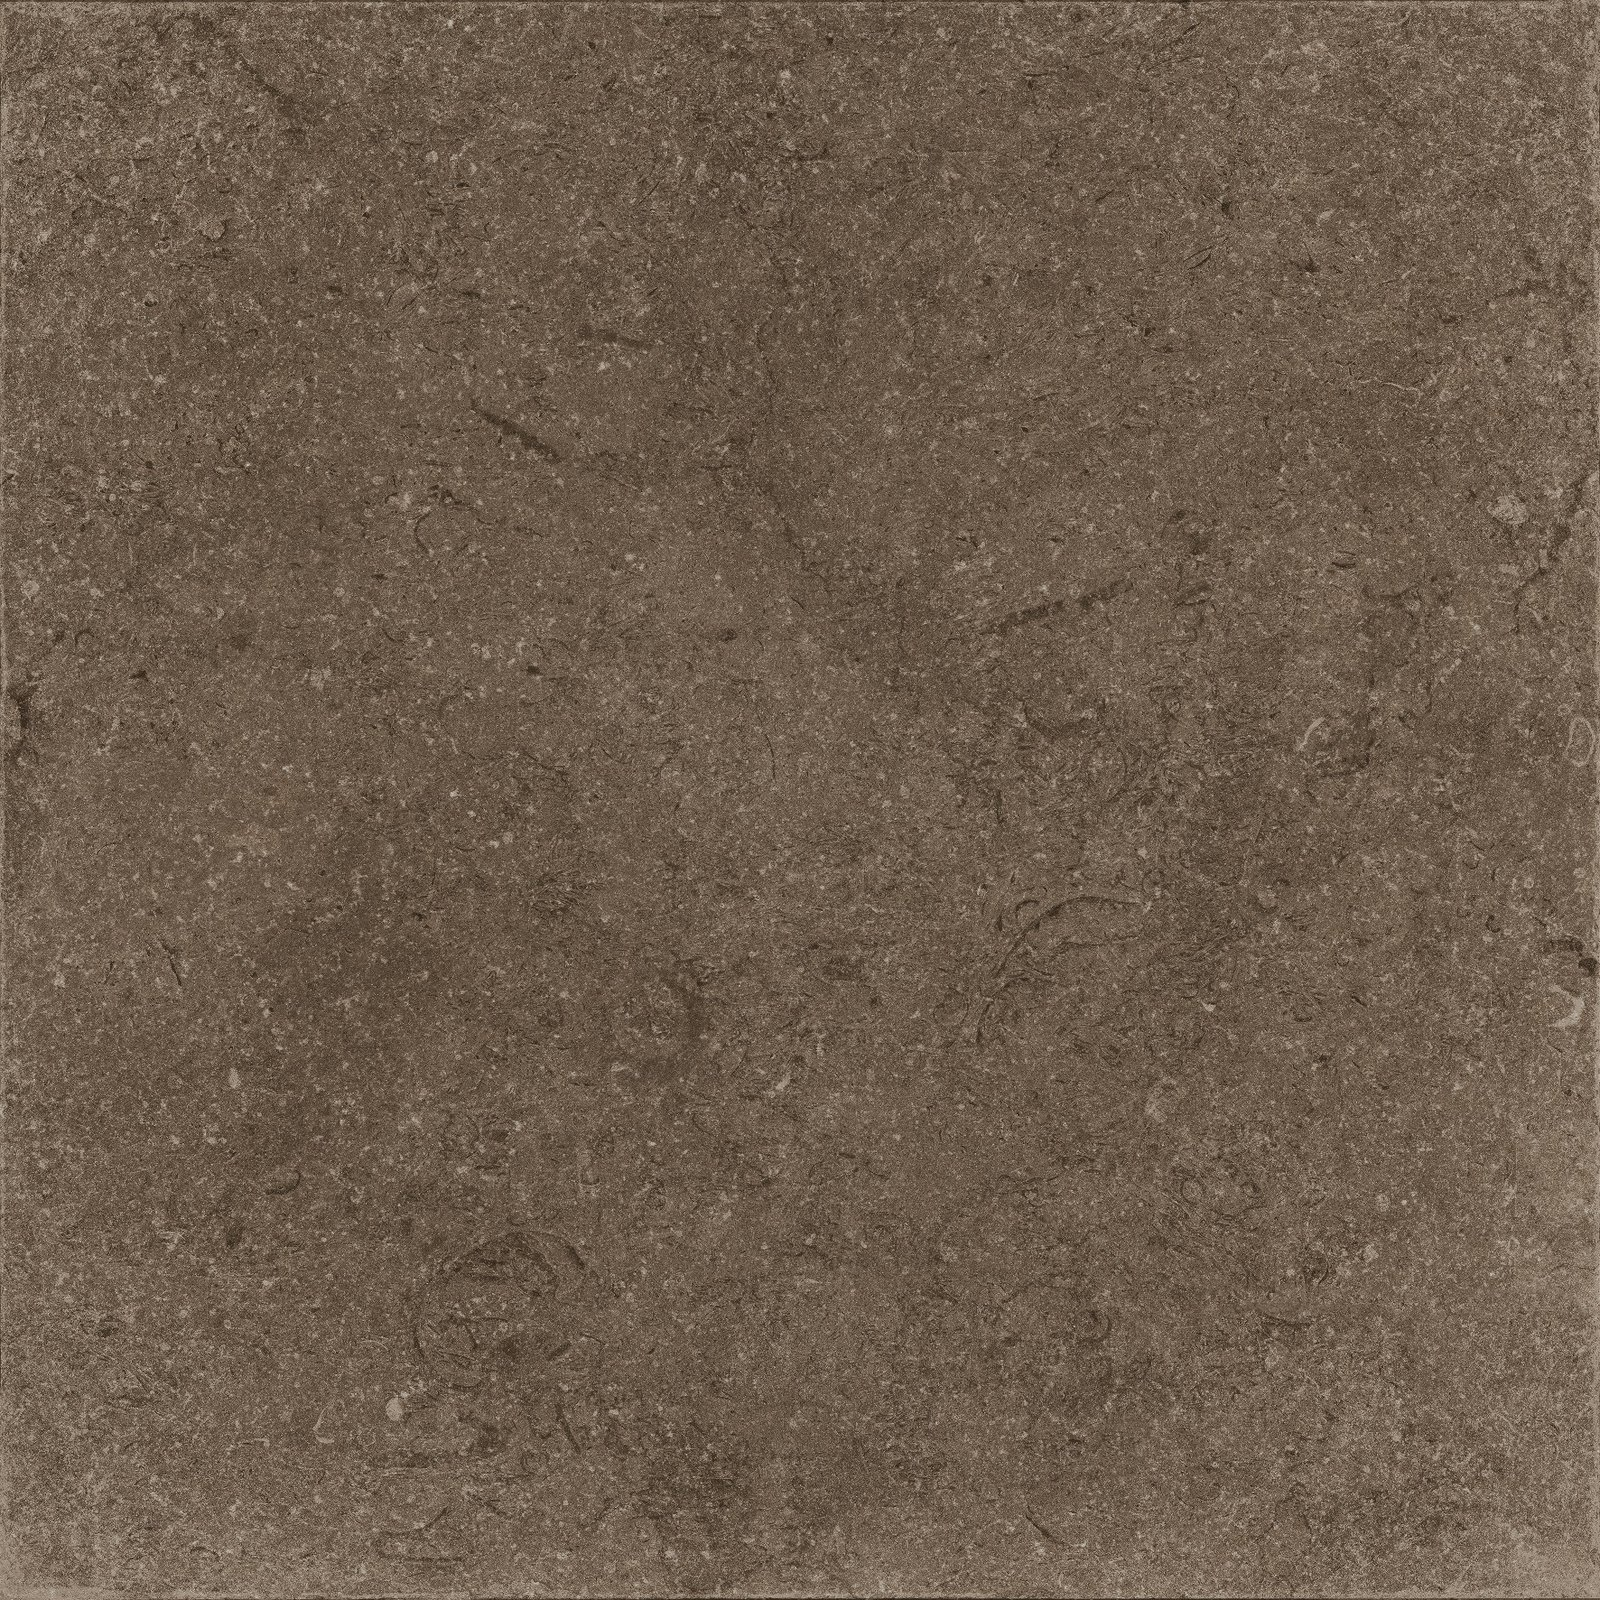 BROWN (X60NF6R) изображение 0